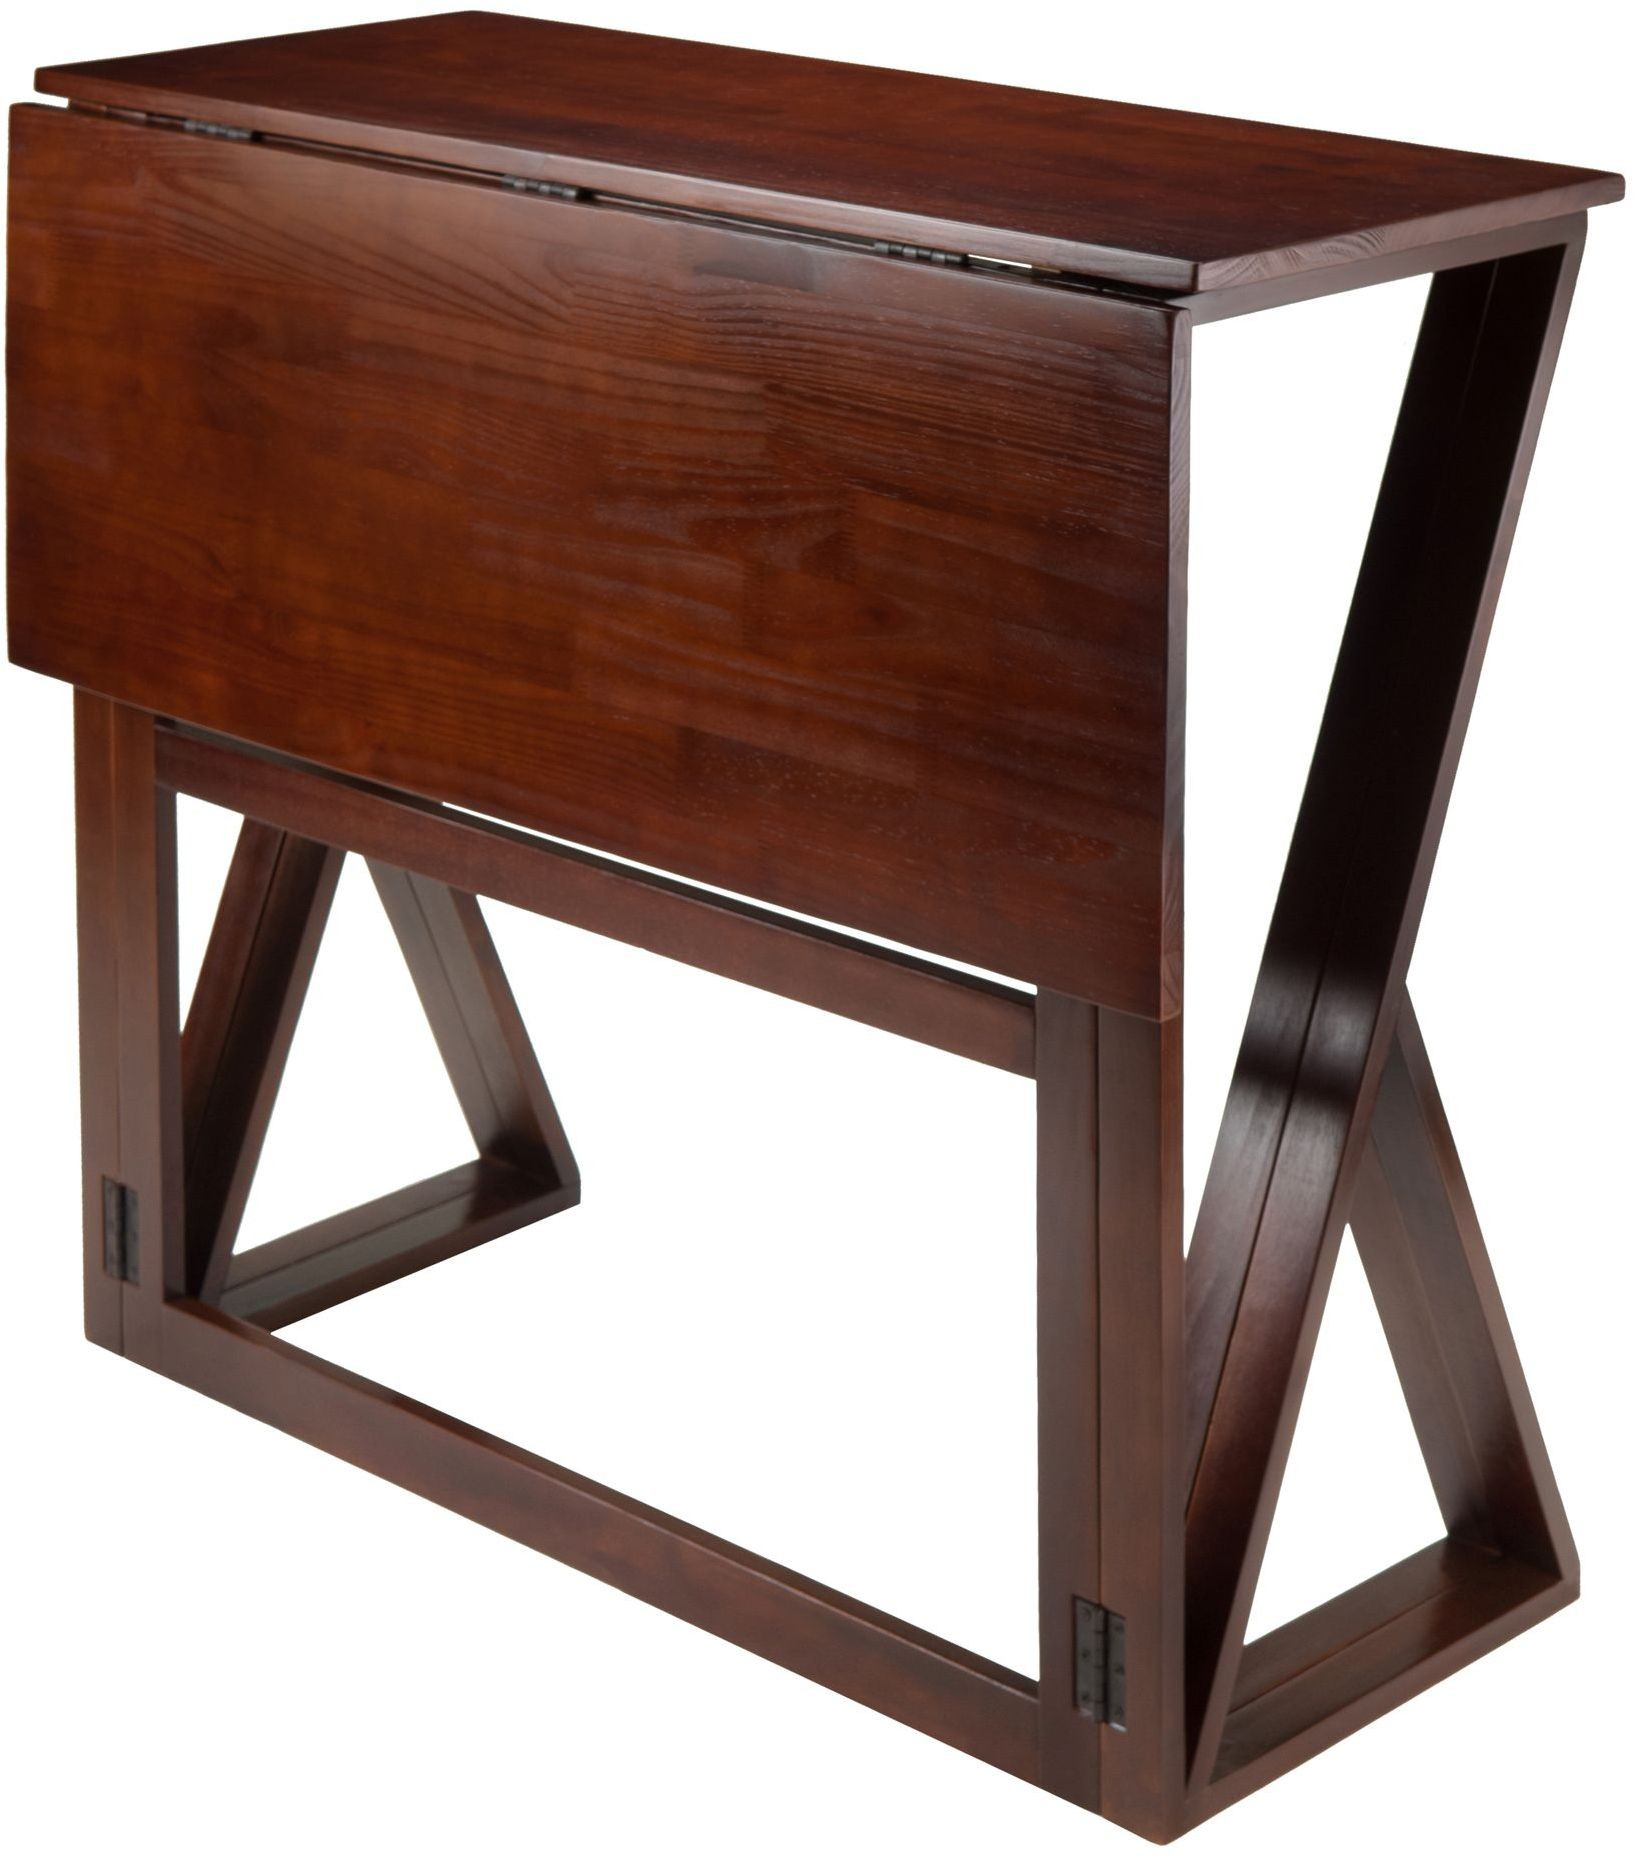 Harrington Antique Walnut Drop Leaf High Dining Table From